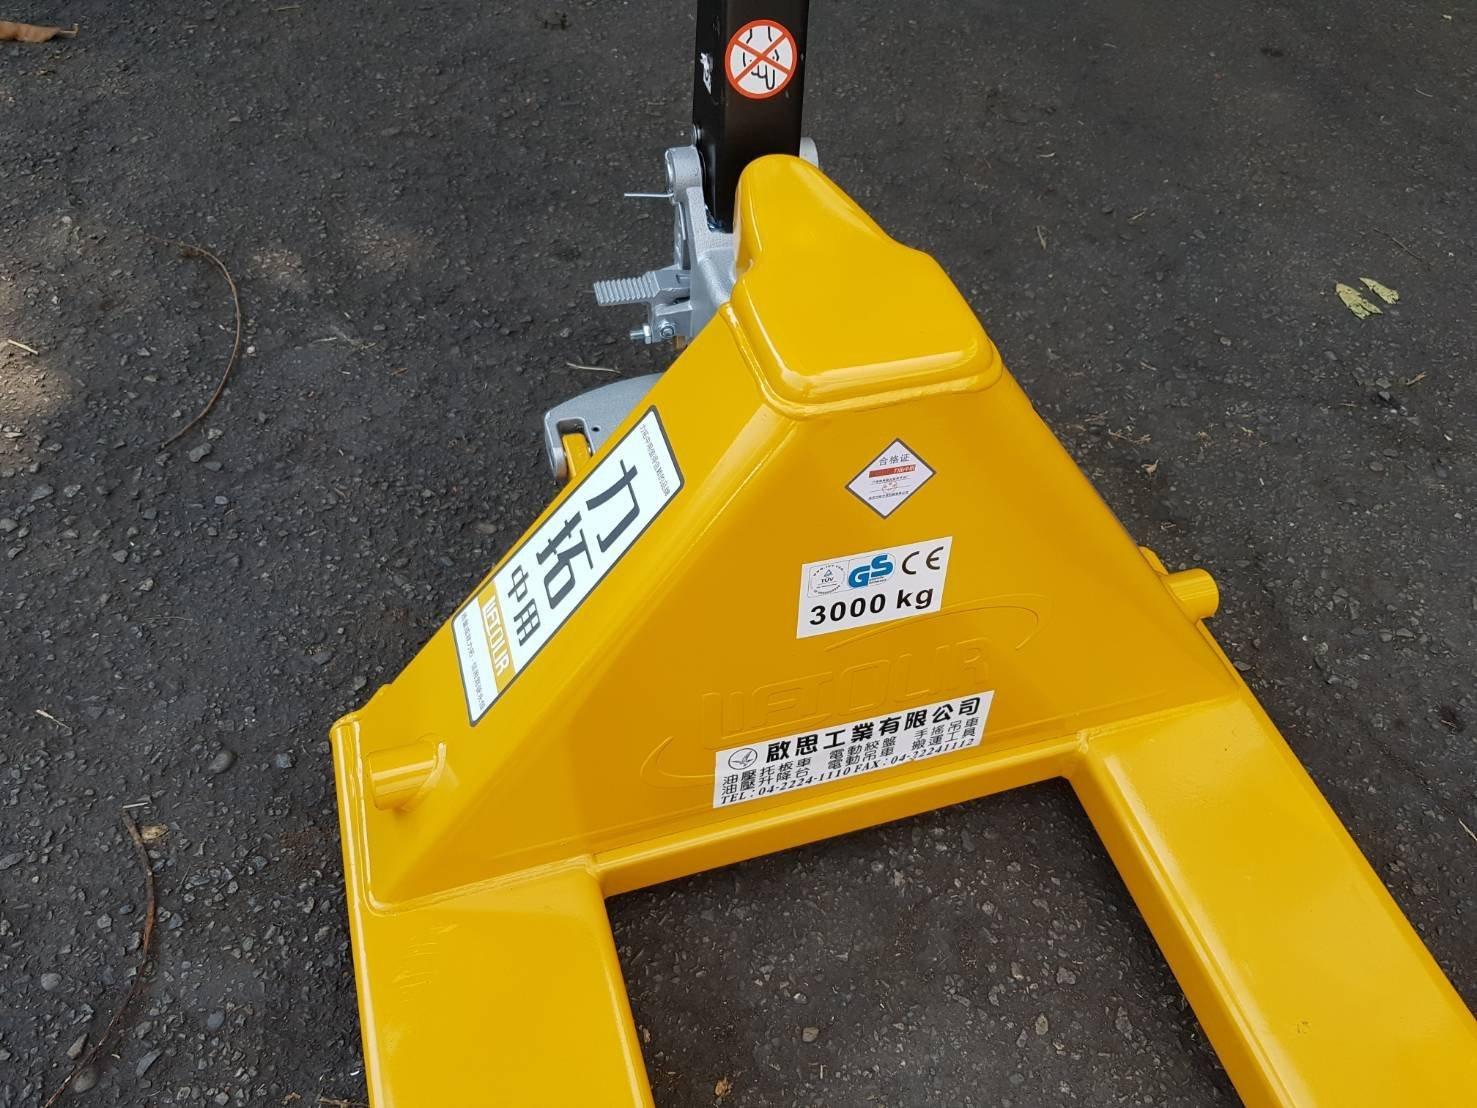 1 TIG 啟思 3000KG 油壓拖板車/托板車/升降台車-/鋼索/搬運工具/升降台車